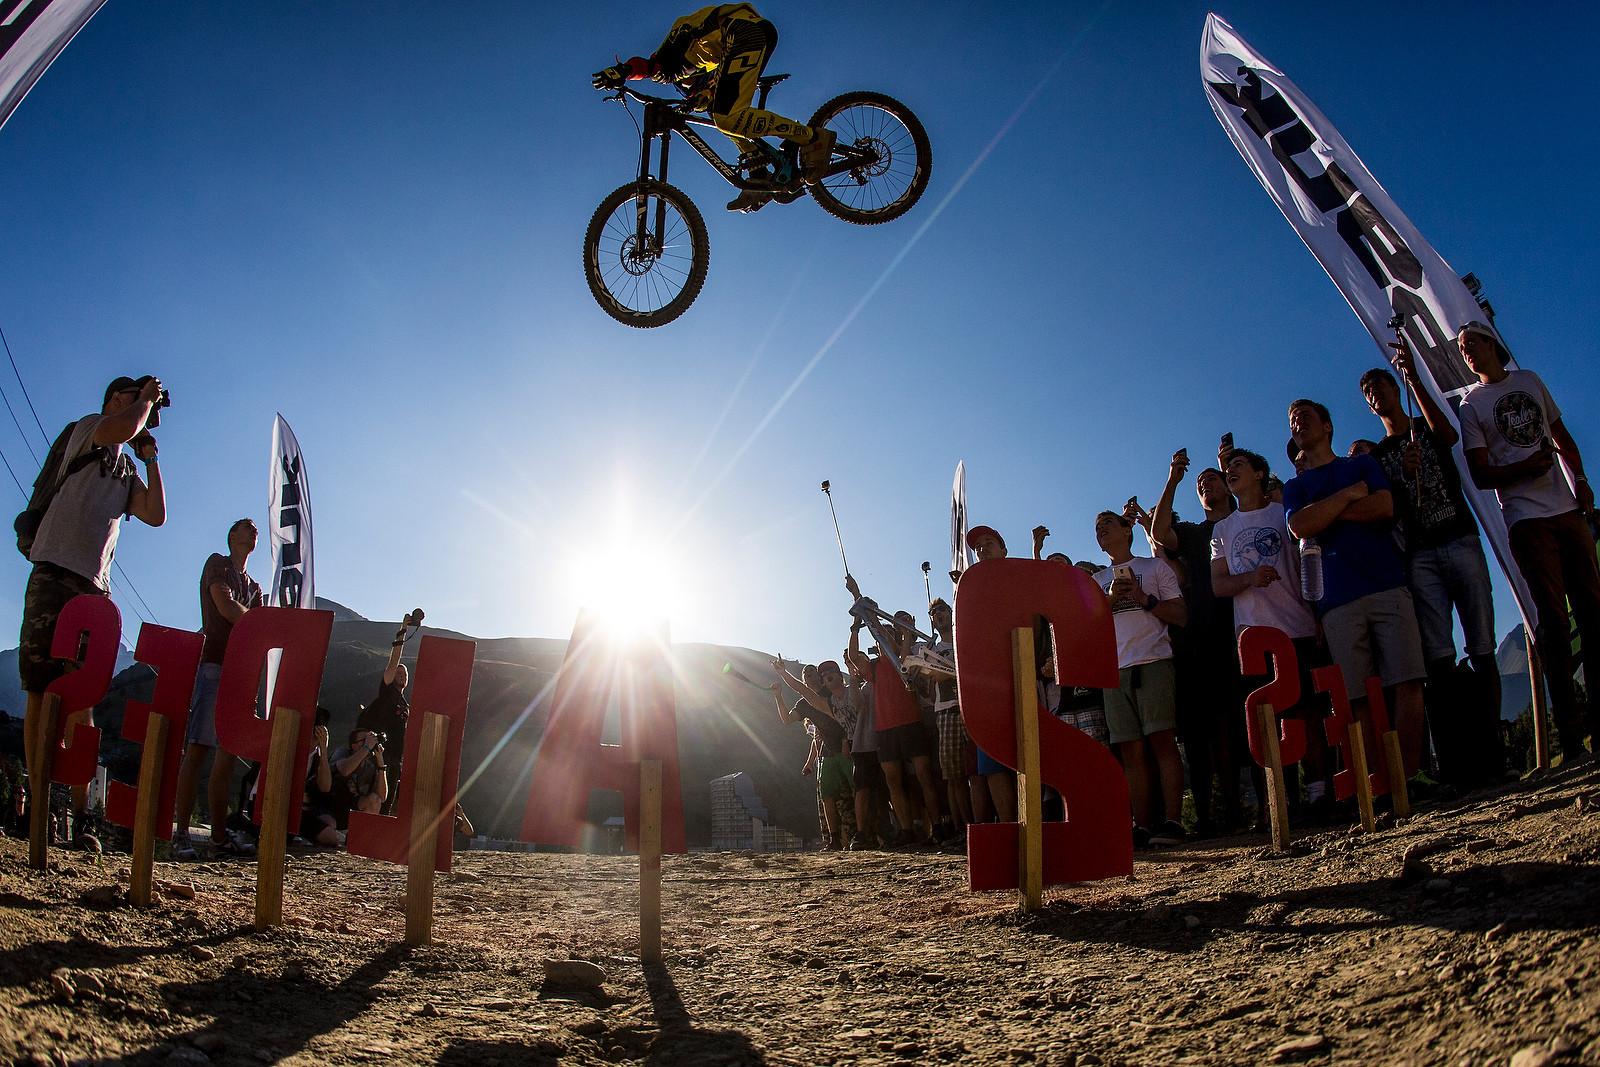 Finn Iles, Whip Off European Champs, Crankworx L2A - Whip Off European Champs, Crankworx L2A - Mountain Biking Pictures - Vital MTB